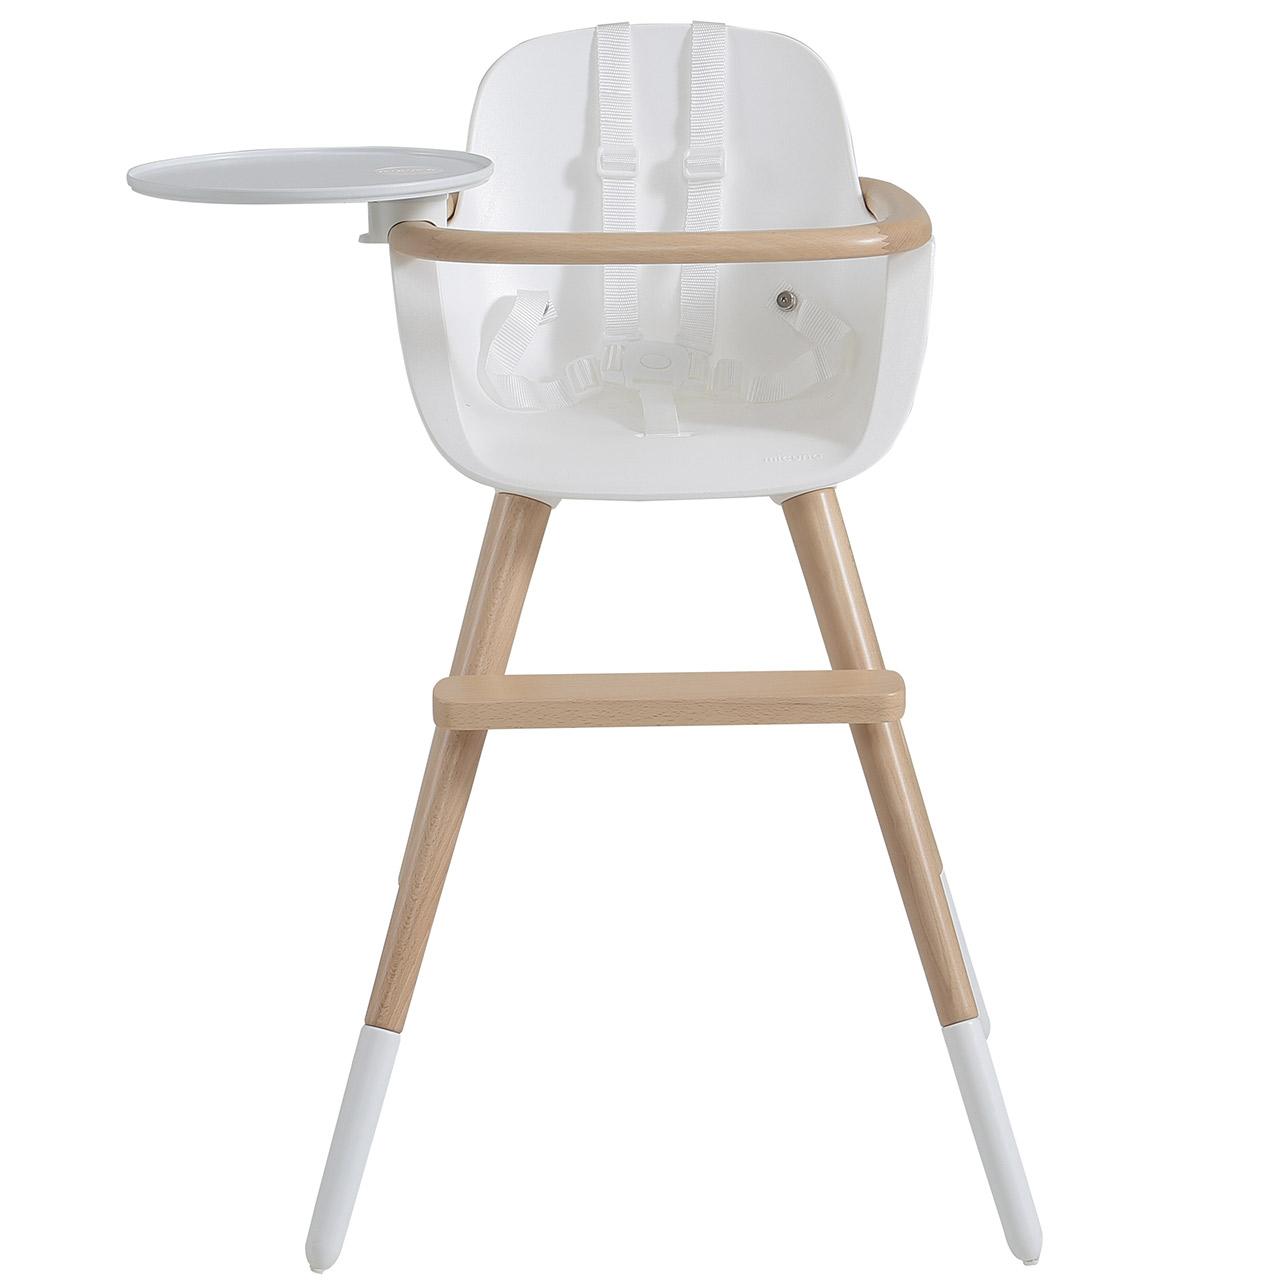 Chaise Évolutive Blanc Harnais Ovo Plus Haute One Avec hCrdxsQBto